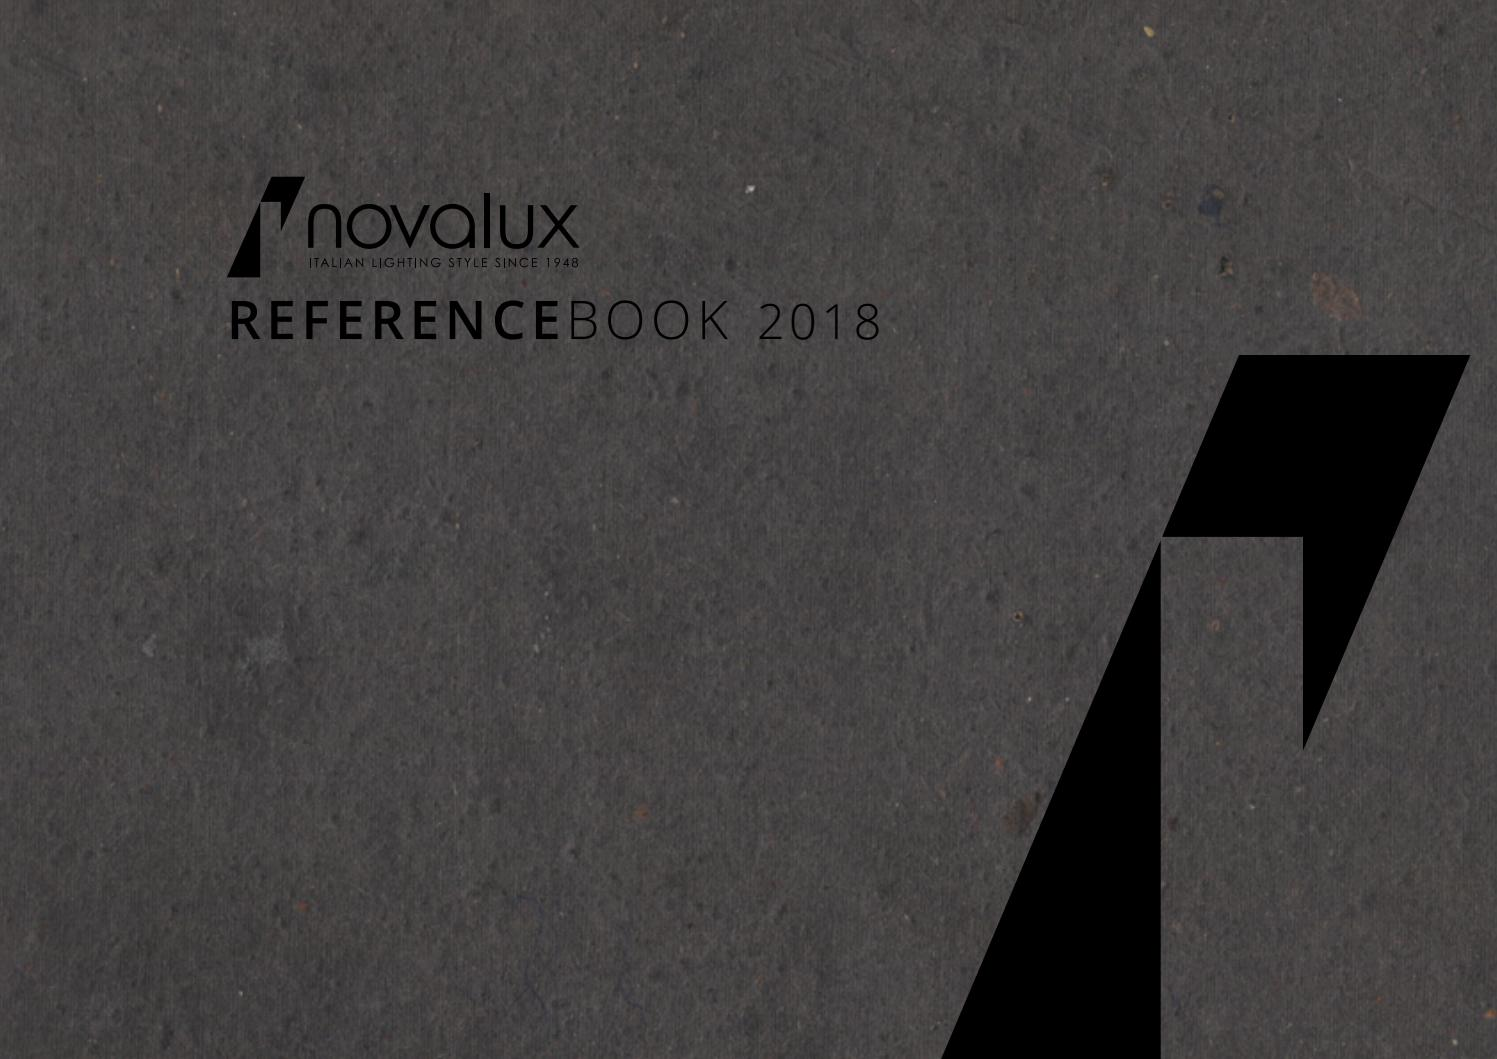 Plafoniera Da Esterno Novalux : Reference book by novaluxitalia issuu